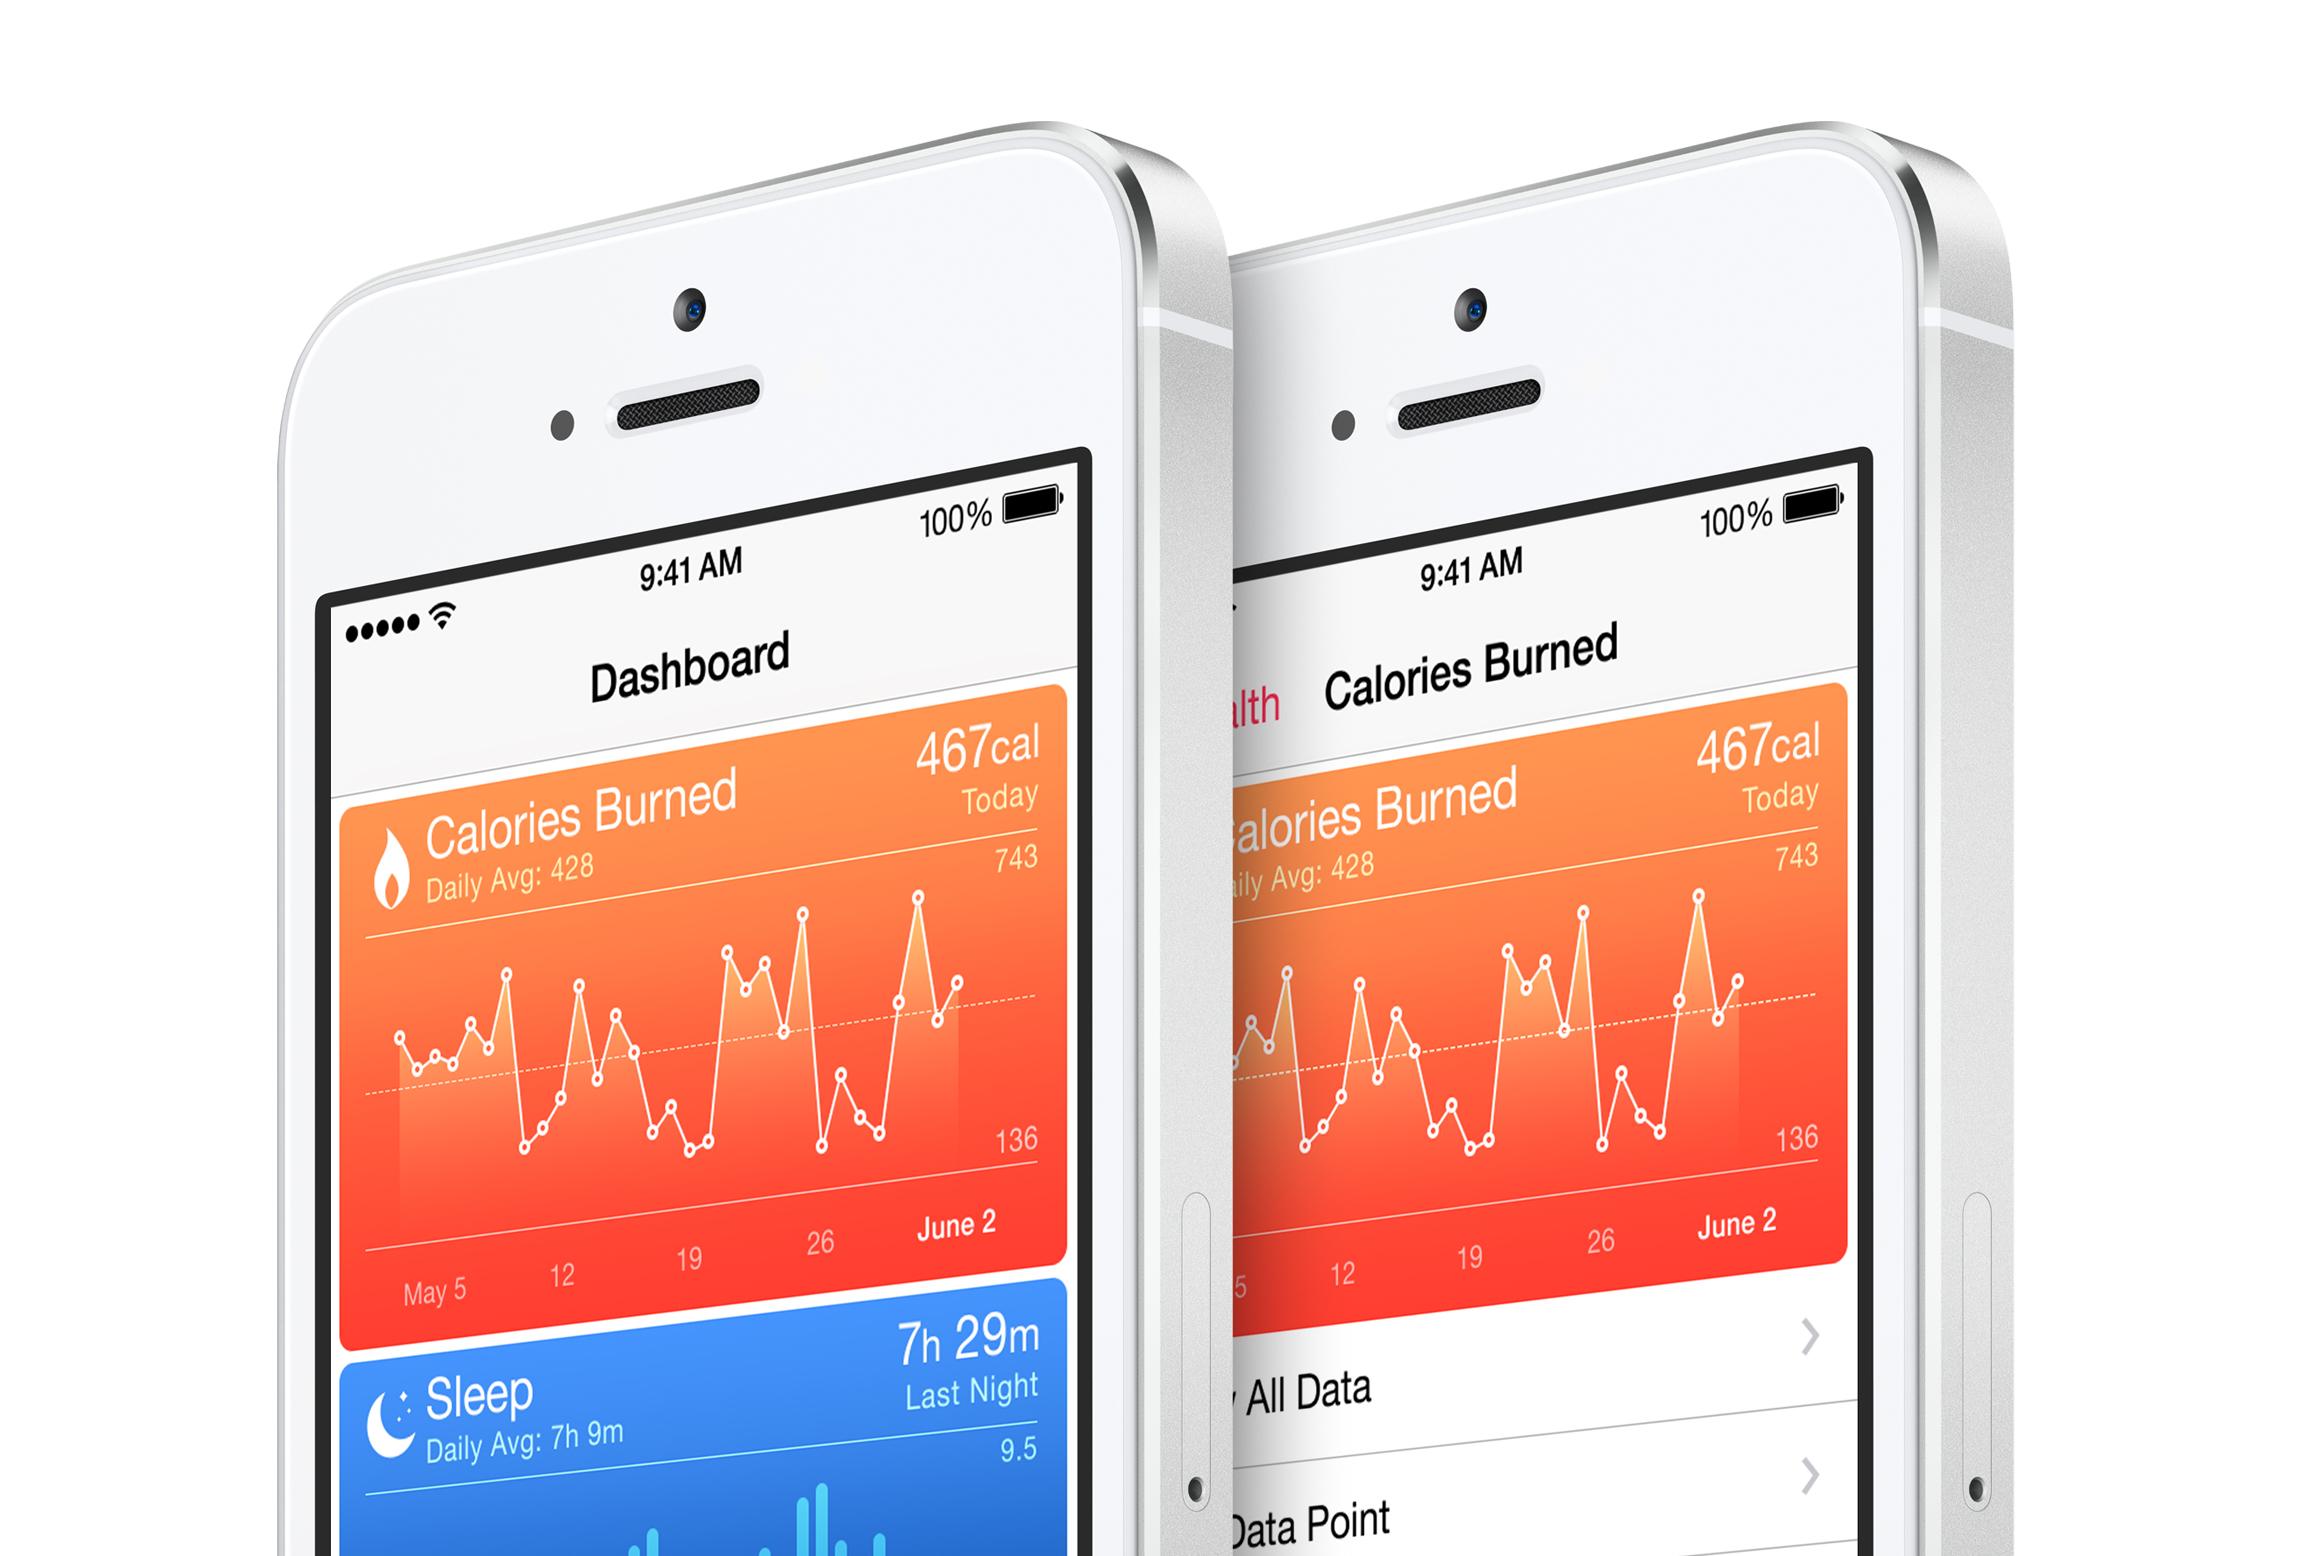 Apple's Health app